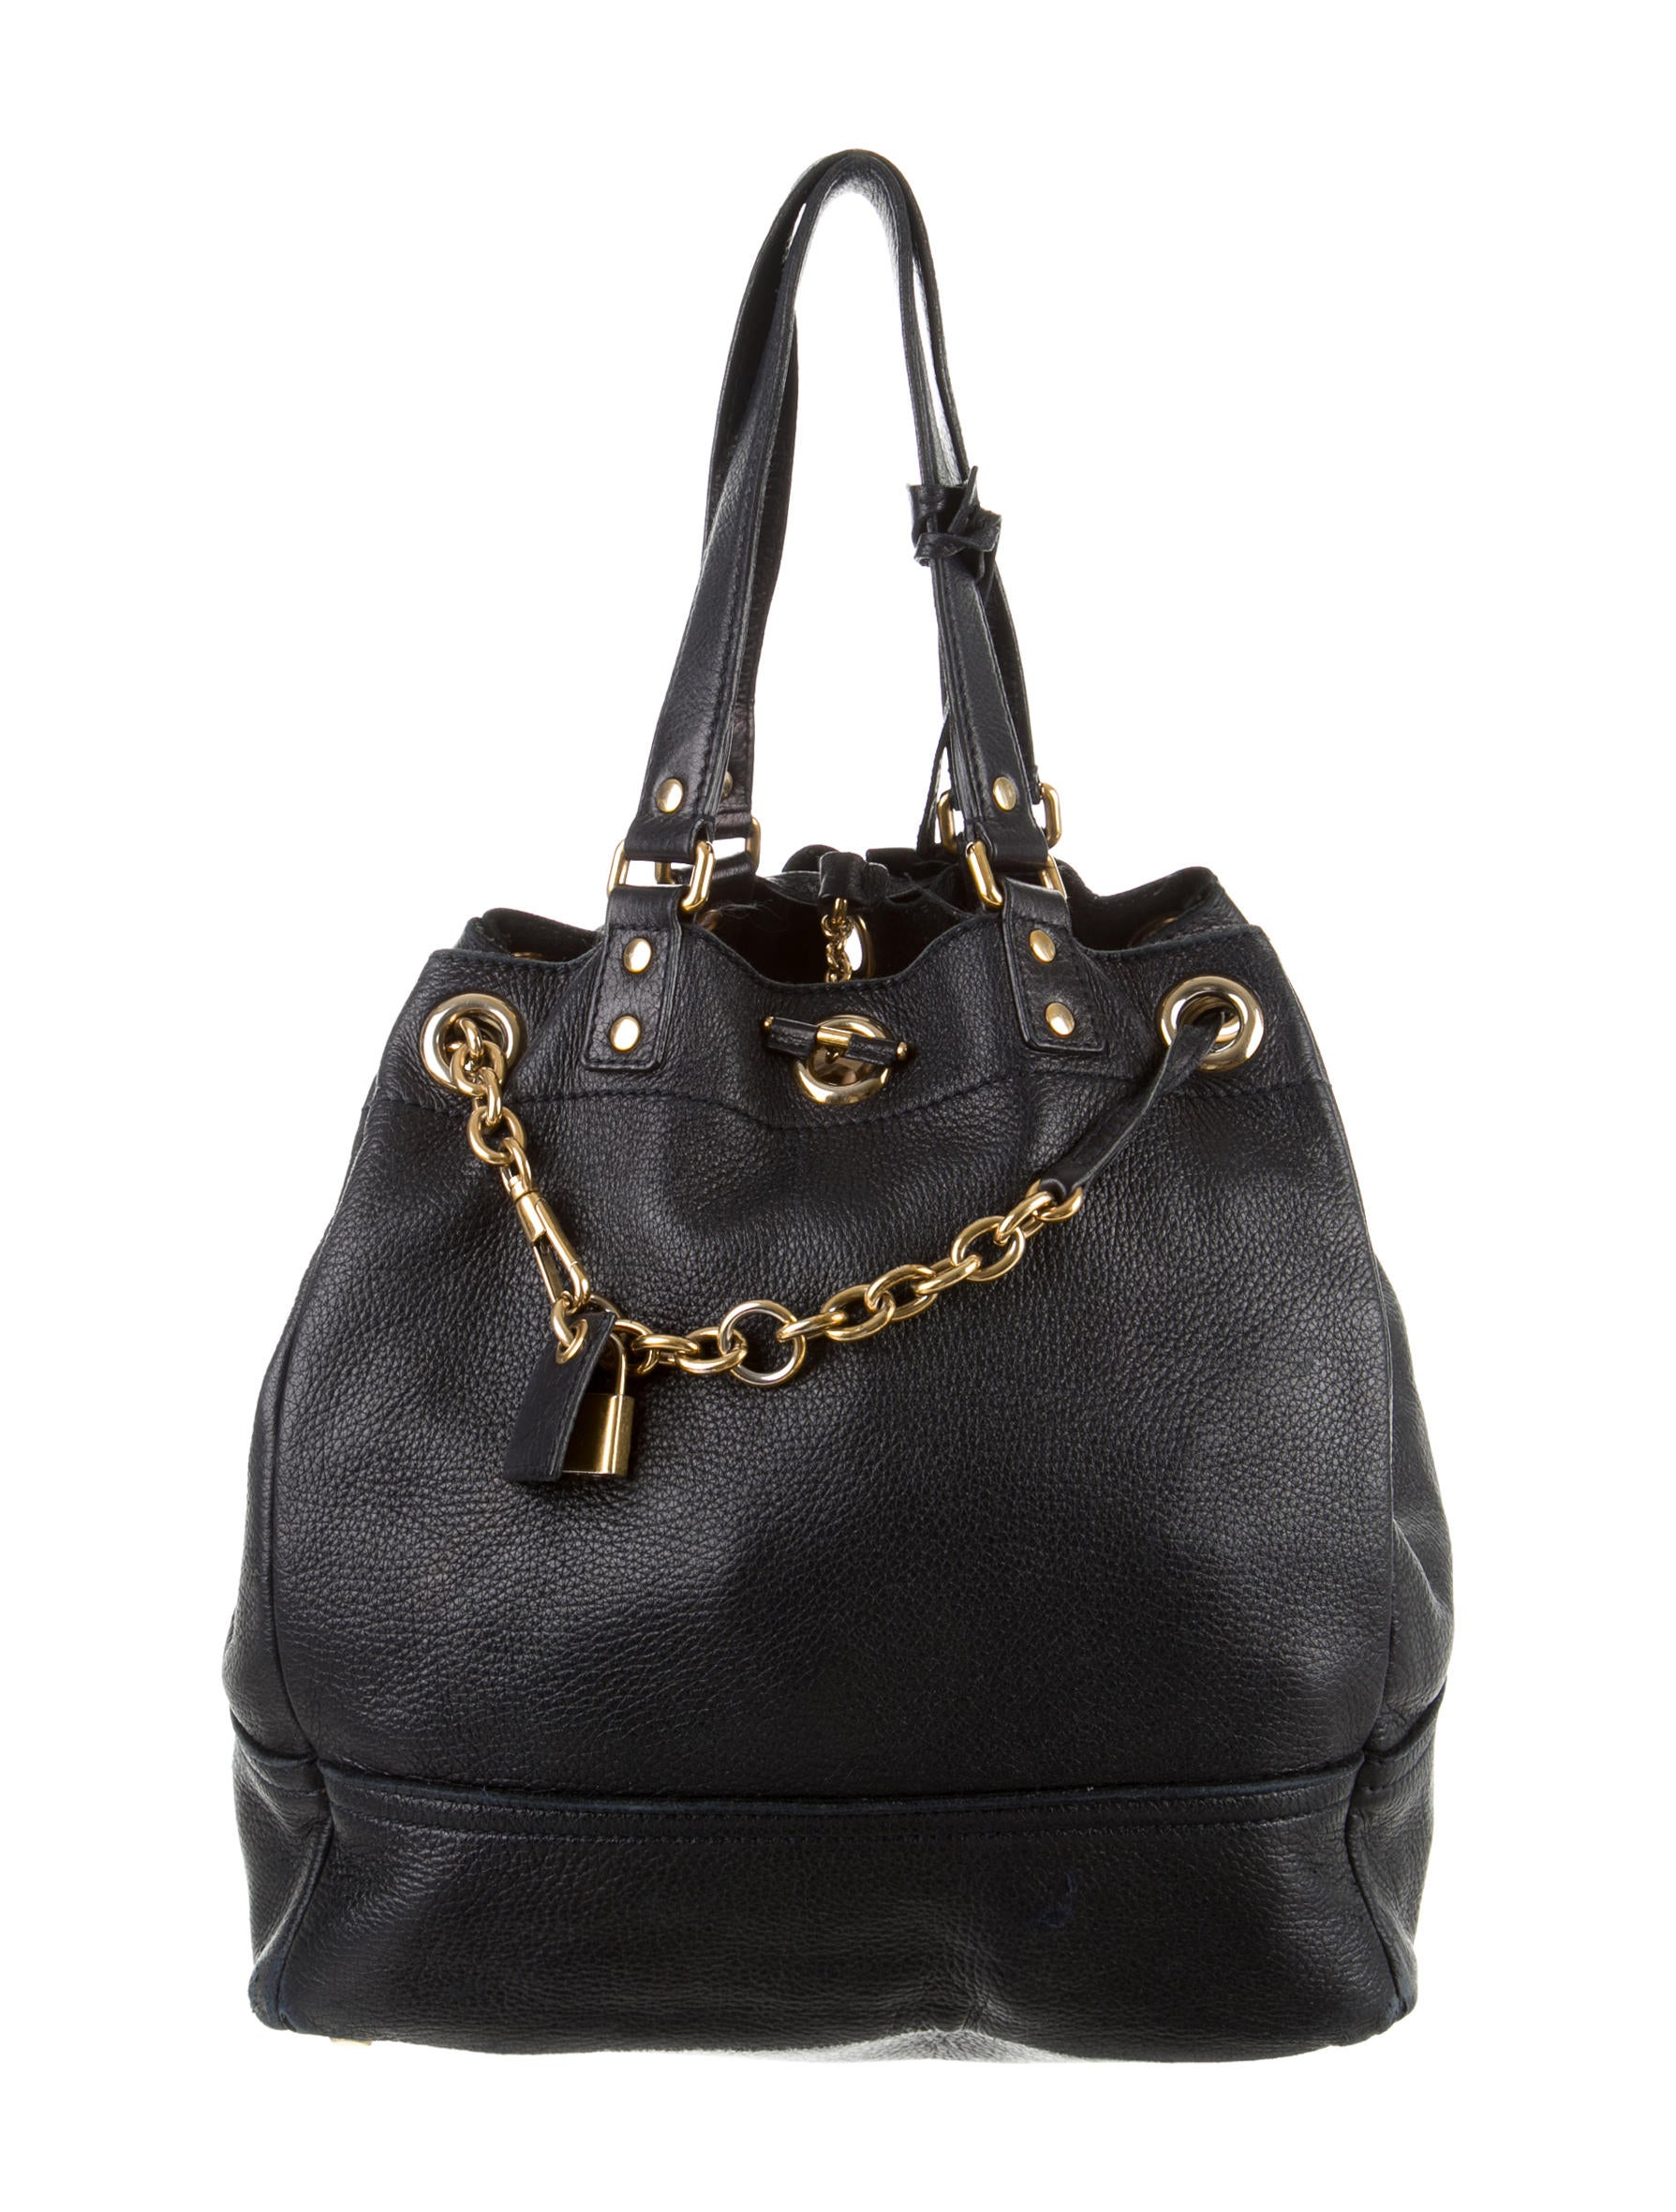 yves saint laurent handbag outlet - yves saint laurent faubourg chain pebbled shoulder bag, handbag tag